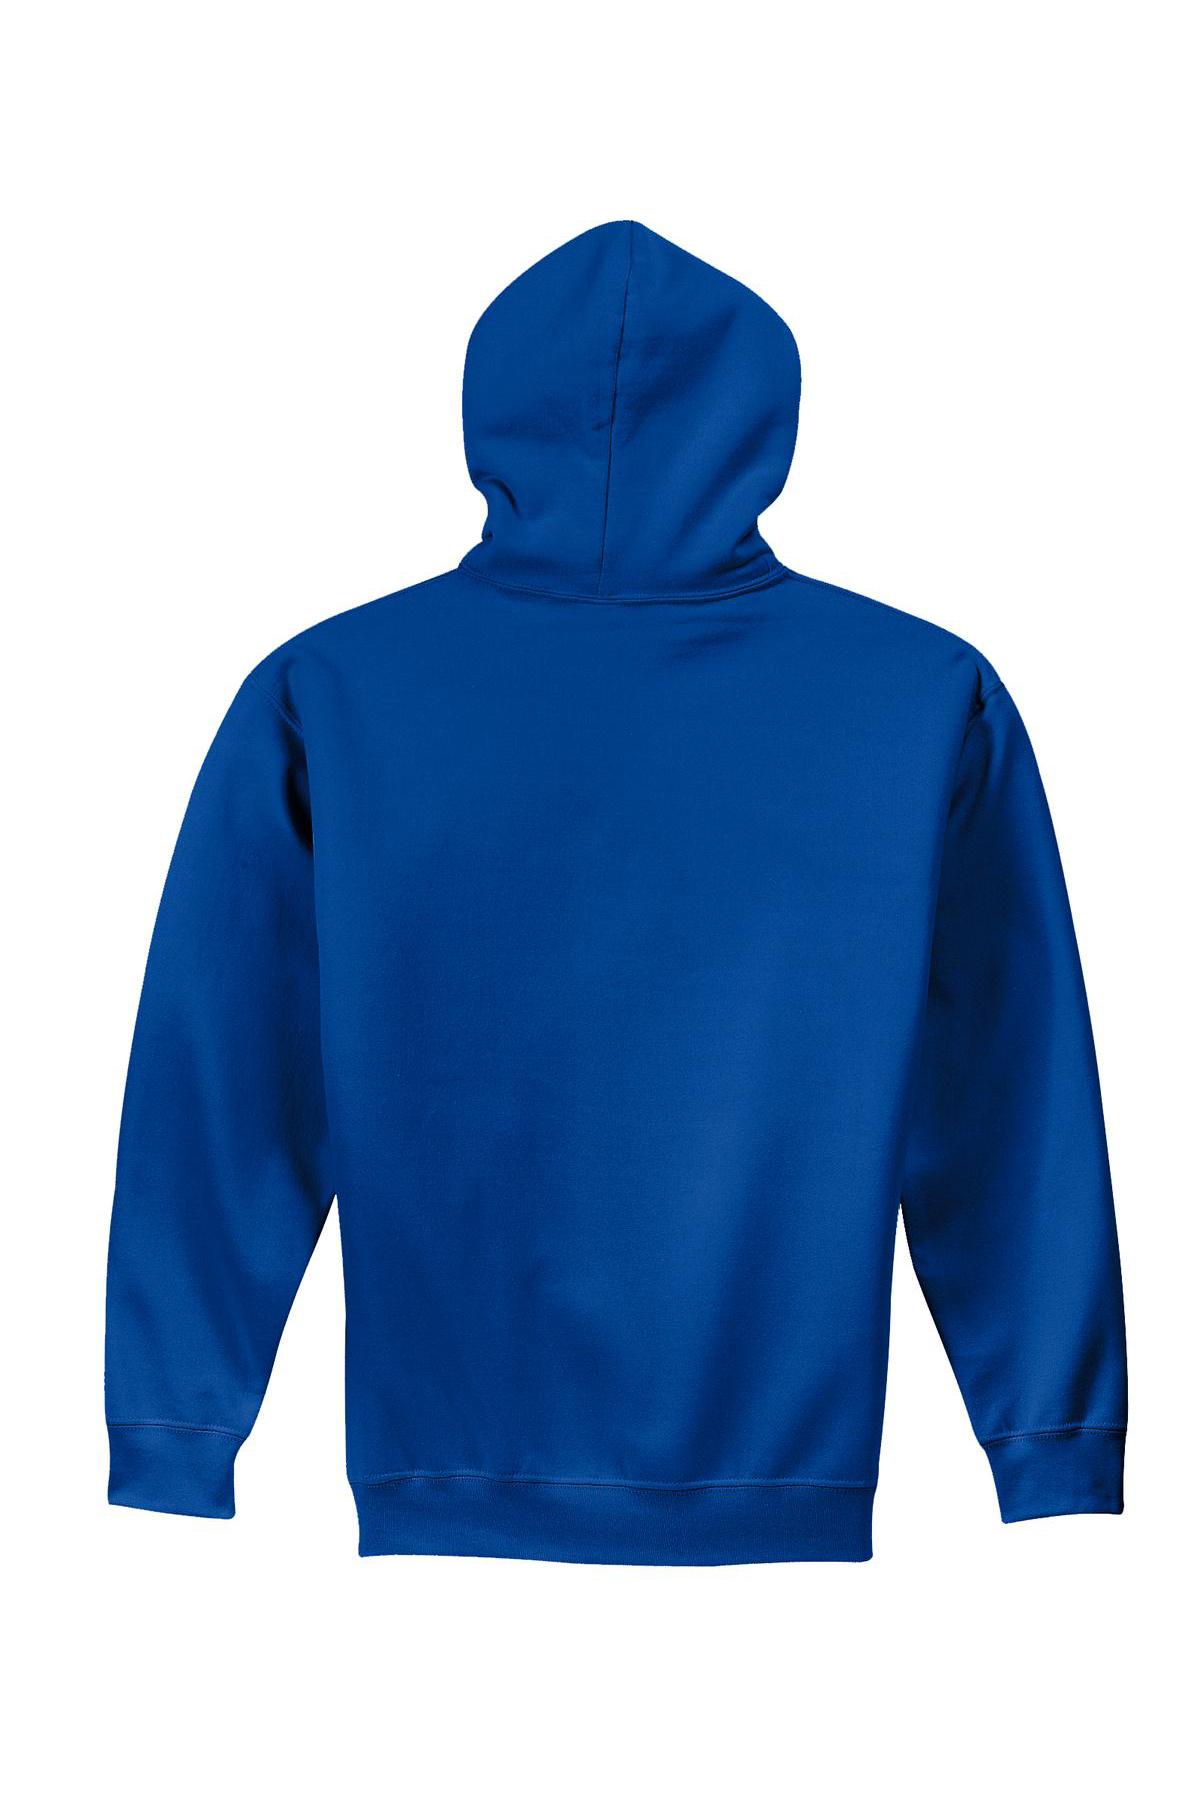 1 Gold Gildan G18500 Heavy Blend Adult Unisex Hooded Sweatshirt M 1 Royal